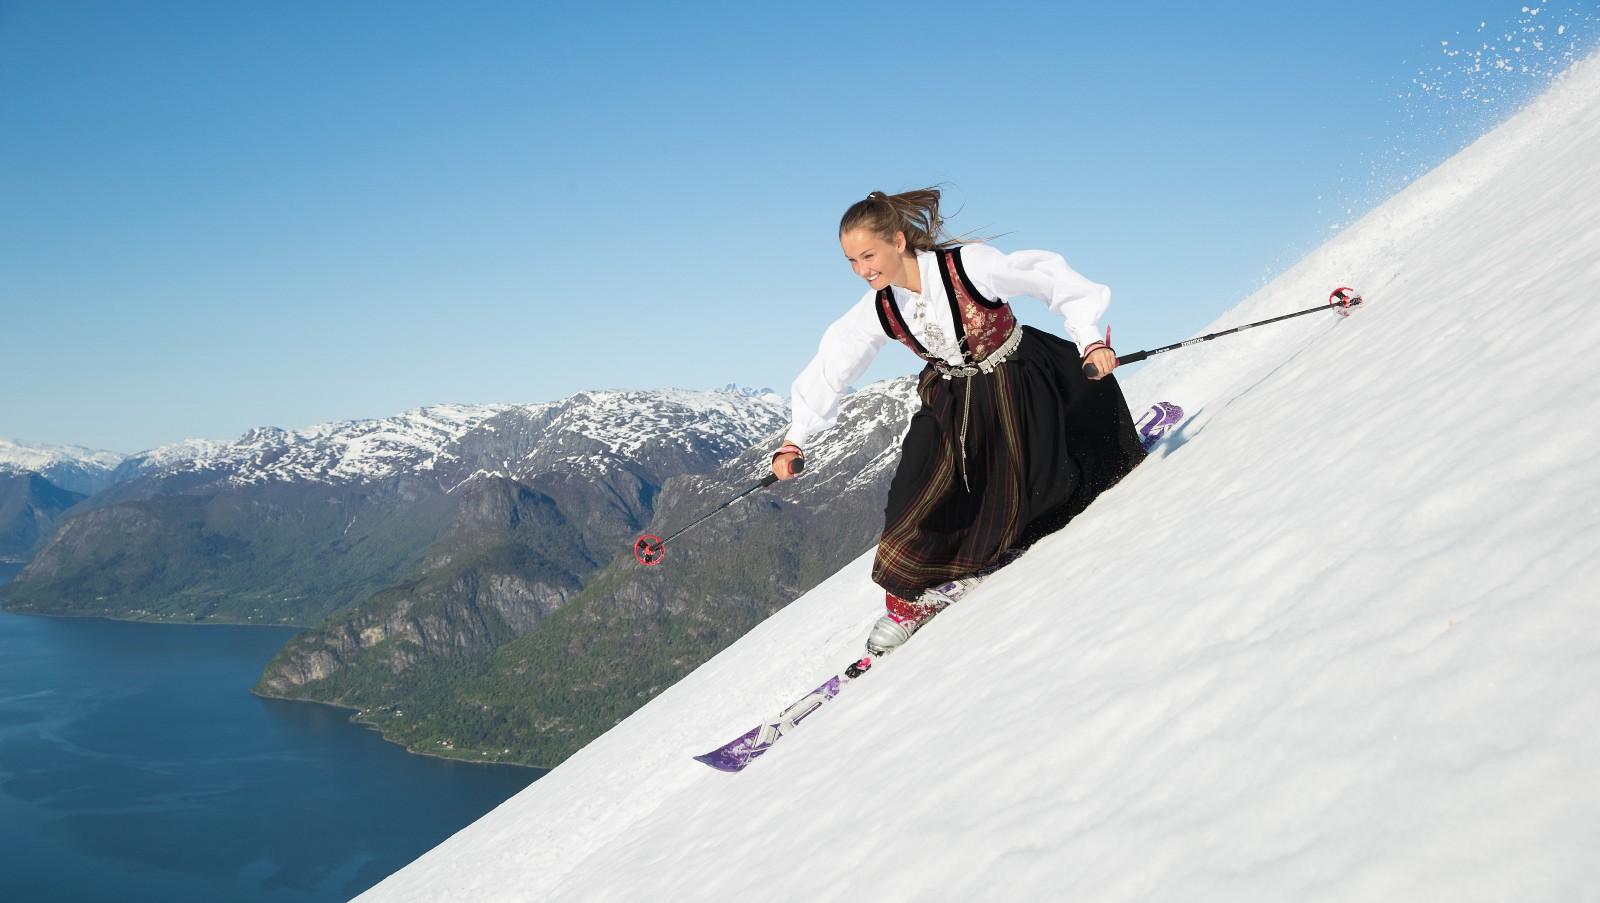 Photo: Håvard Nesbø